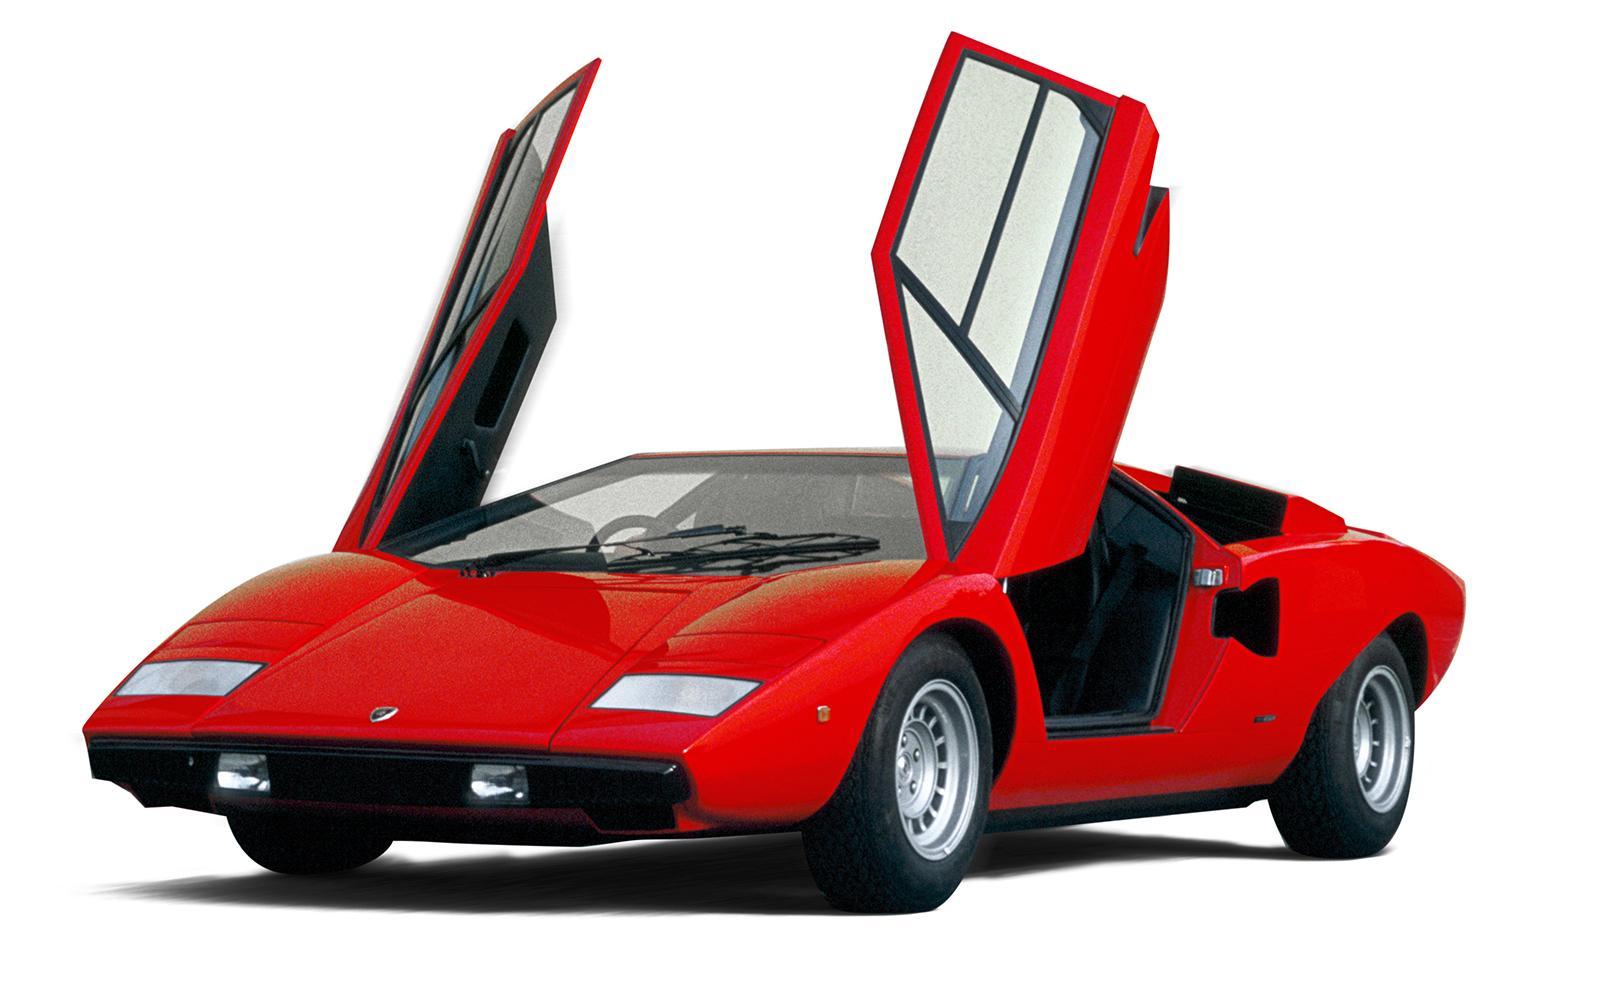 De Coolste Auto S Veel Oud Spul Topgear